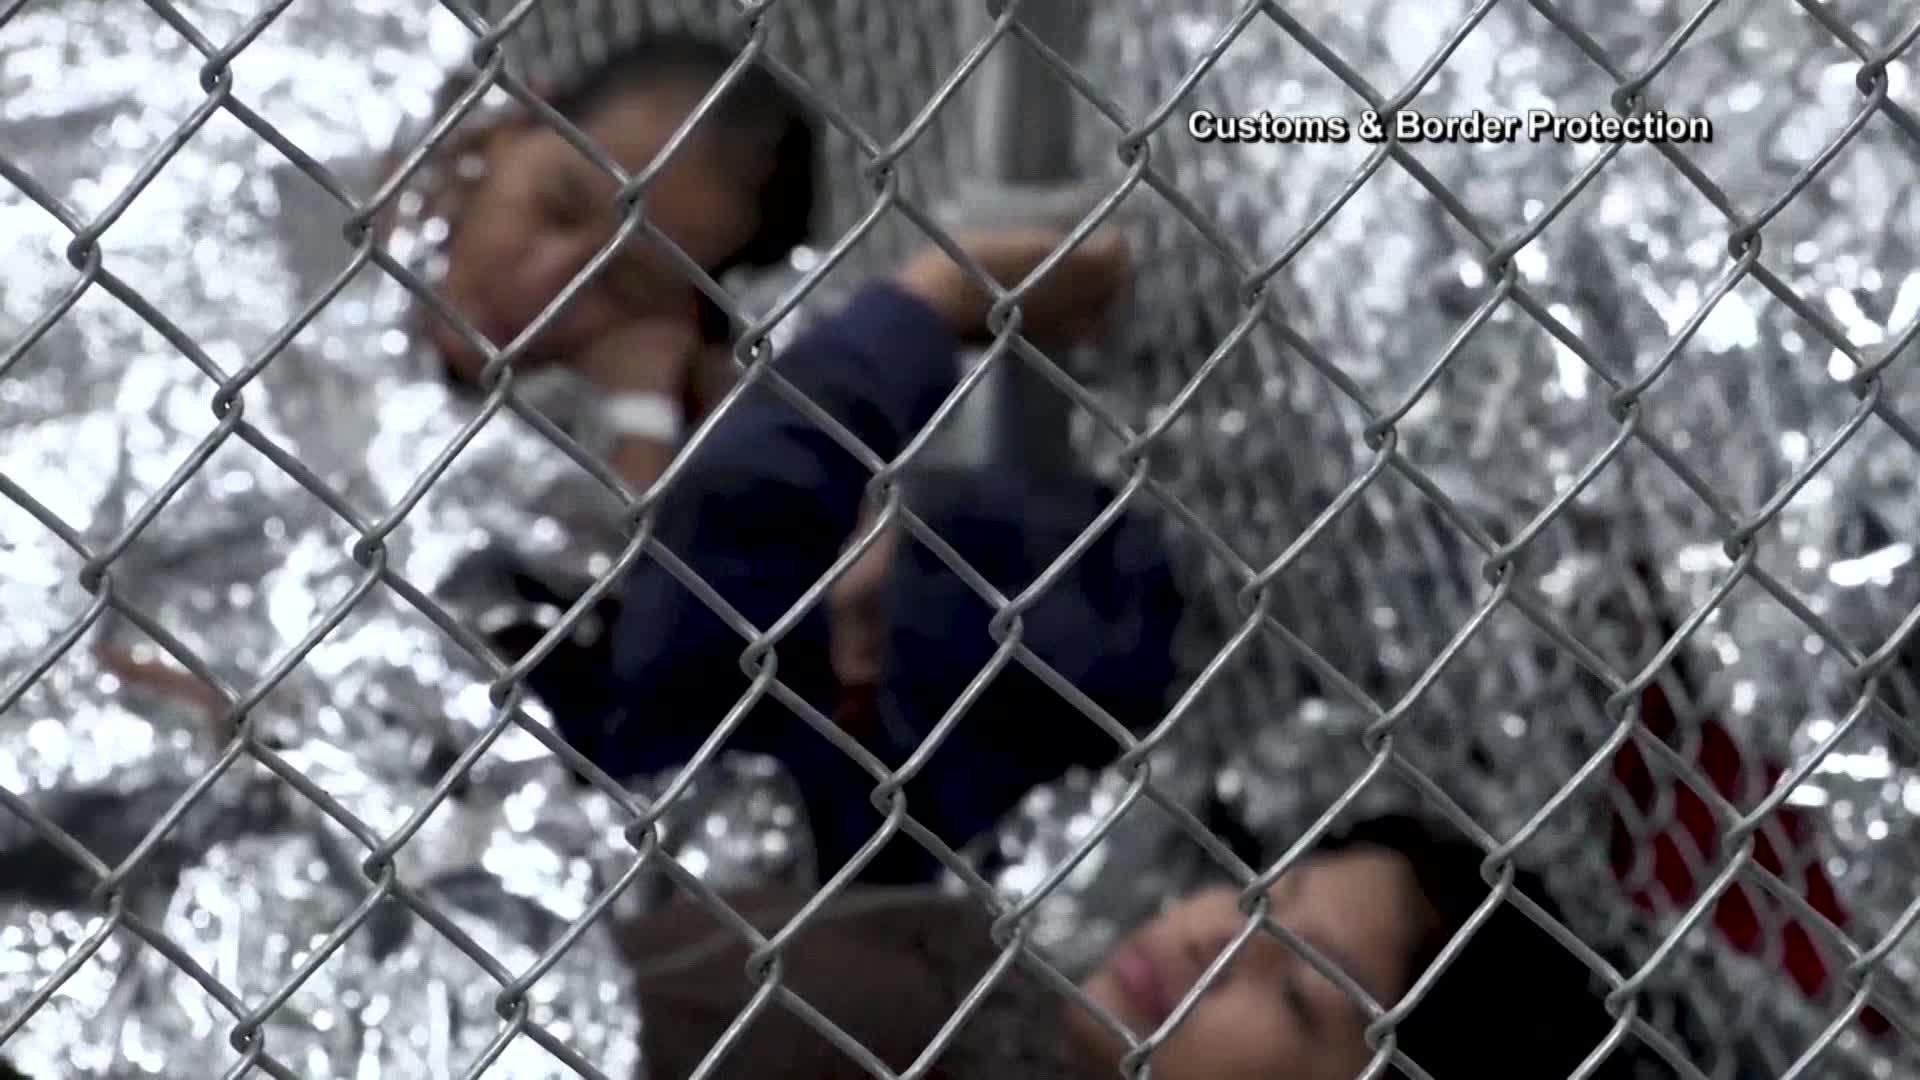 Migrant children at the border